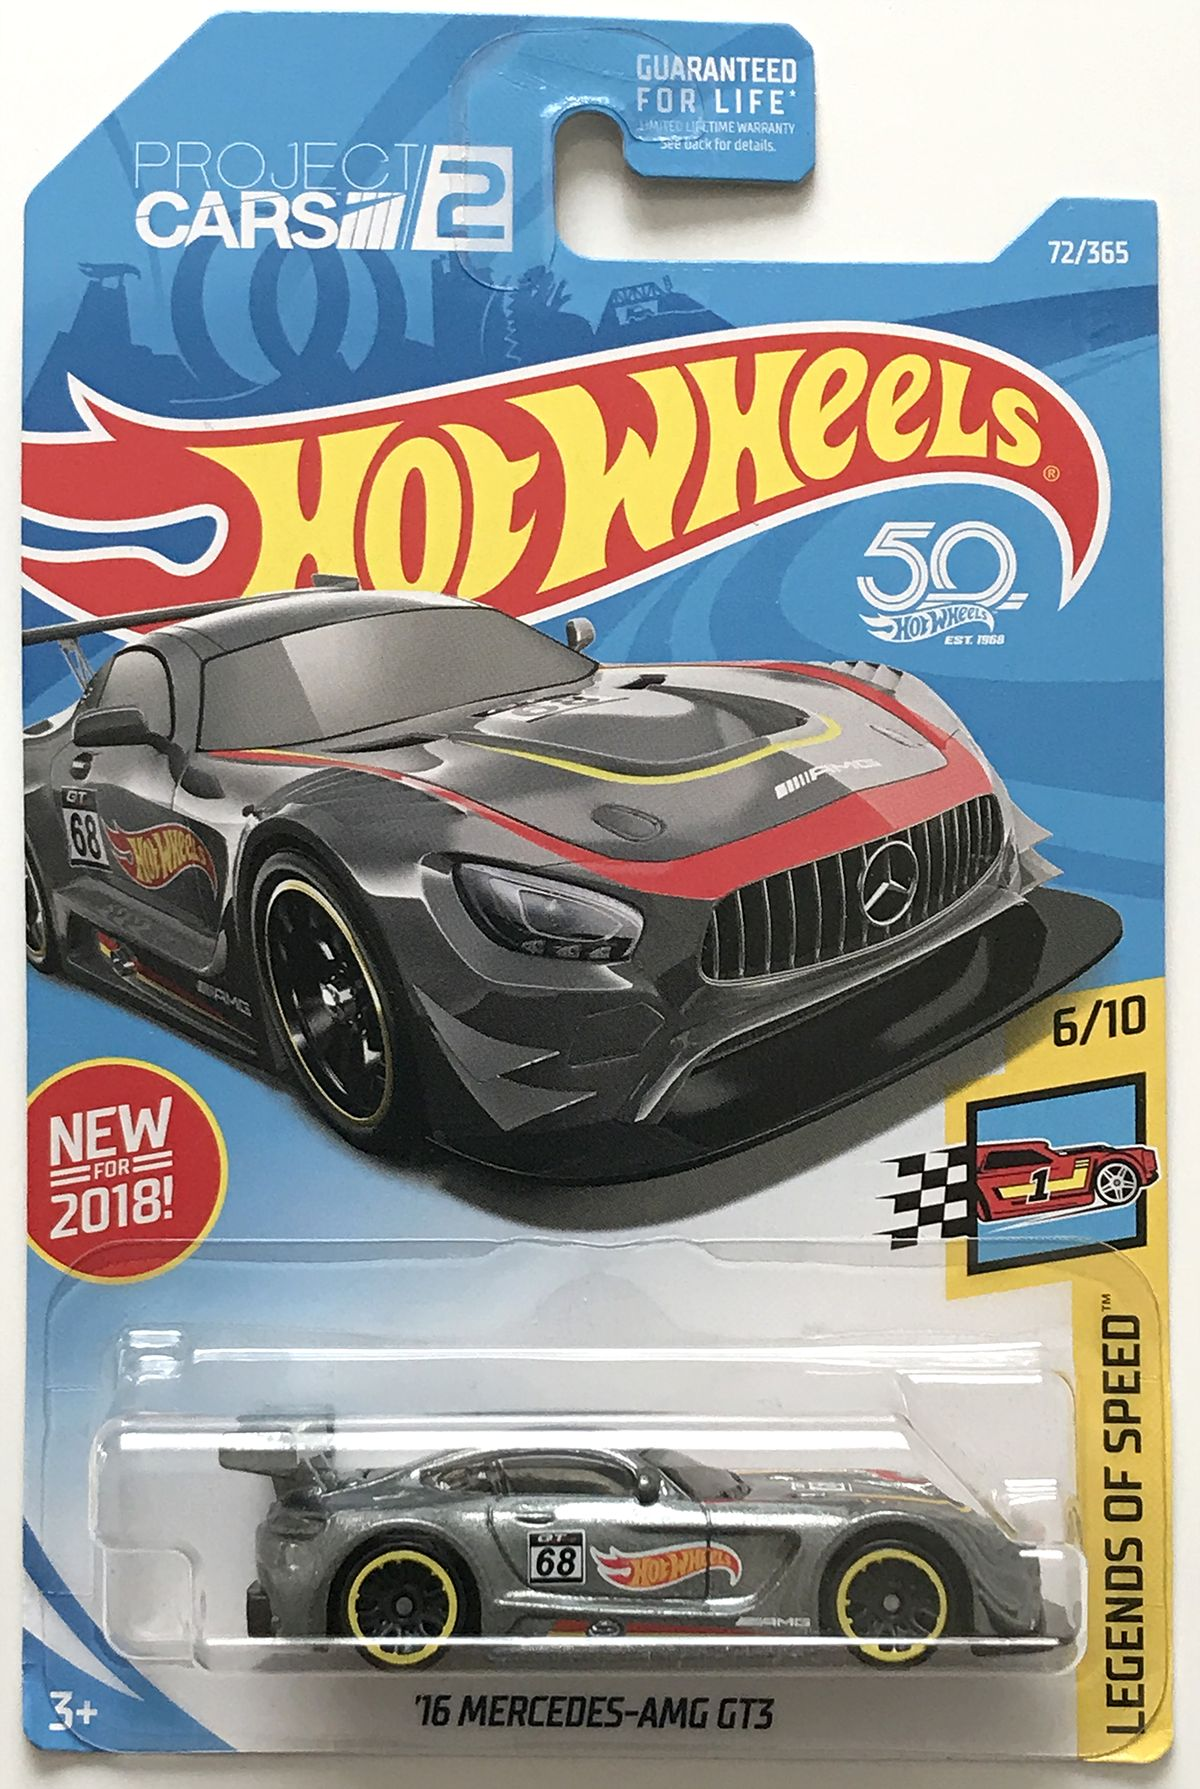 images des voitures hot wheels - Voitures Hot Wheels